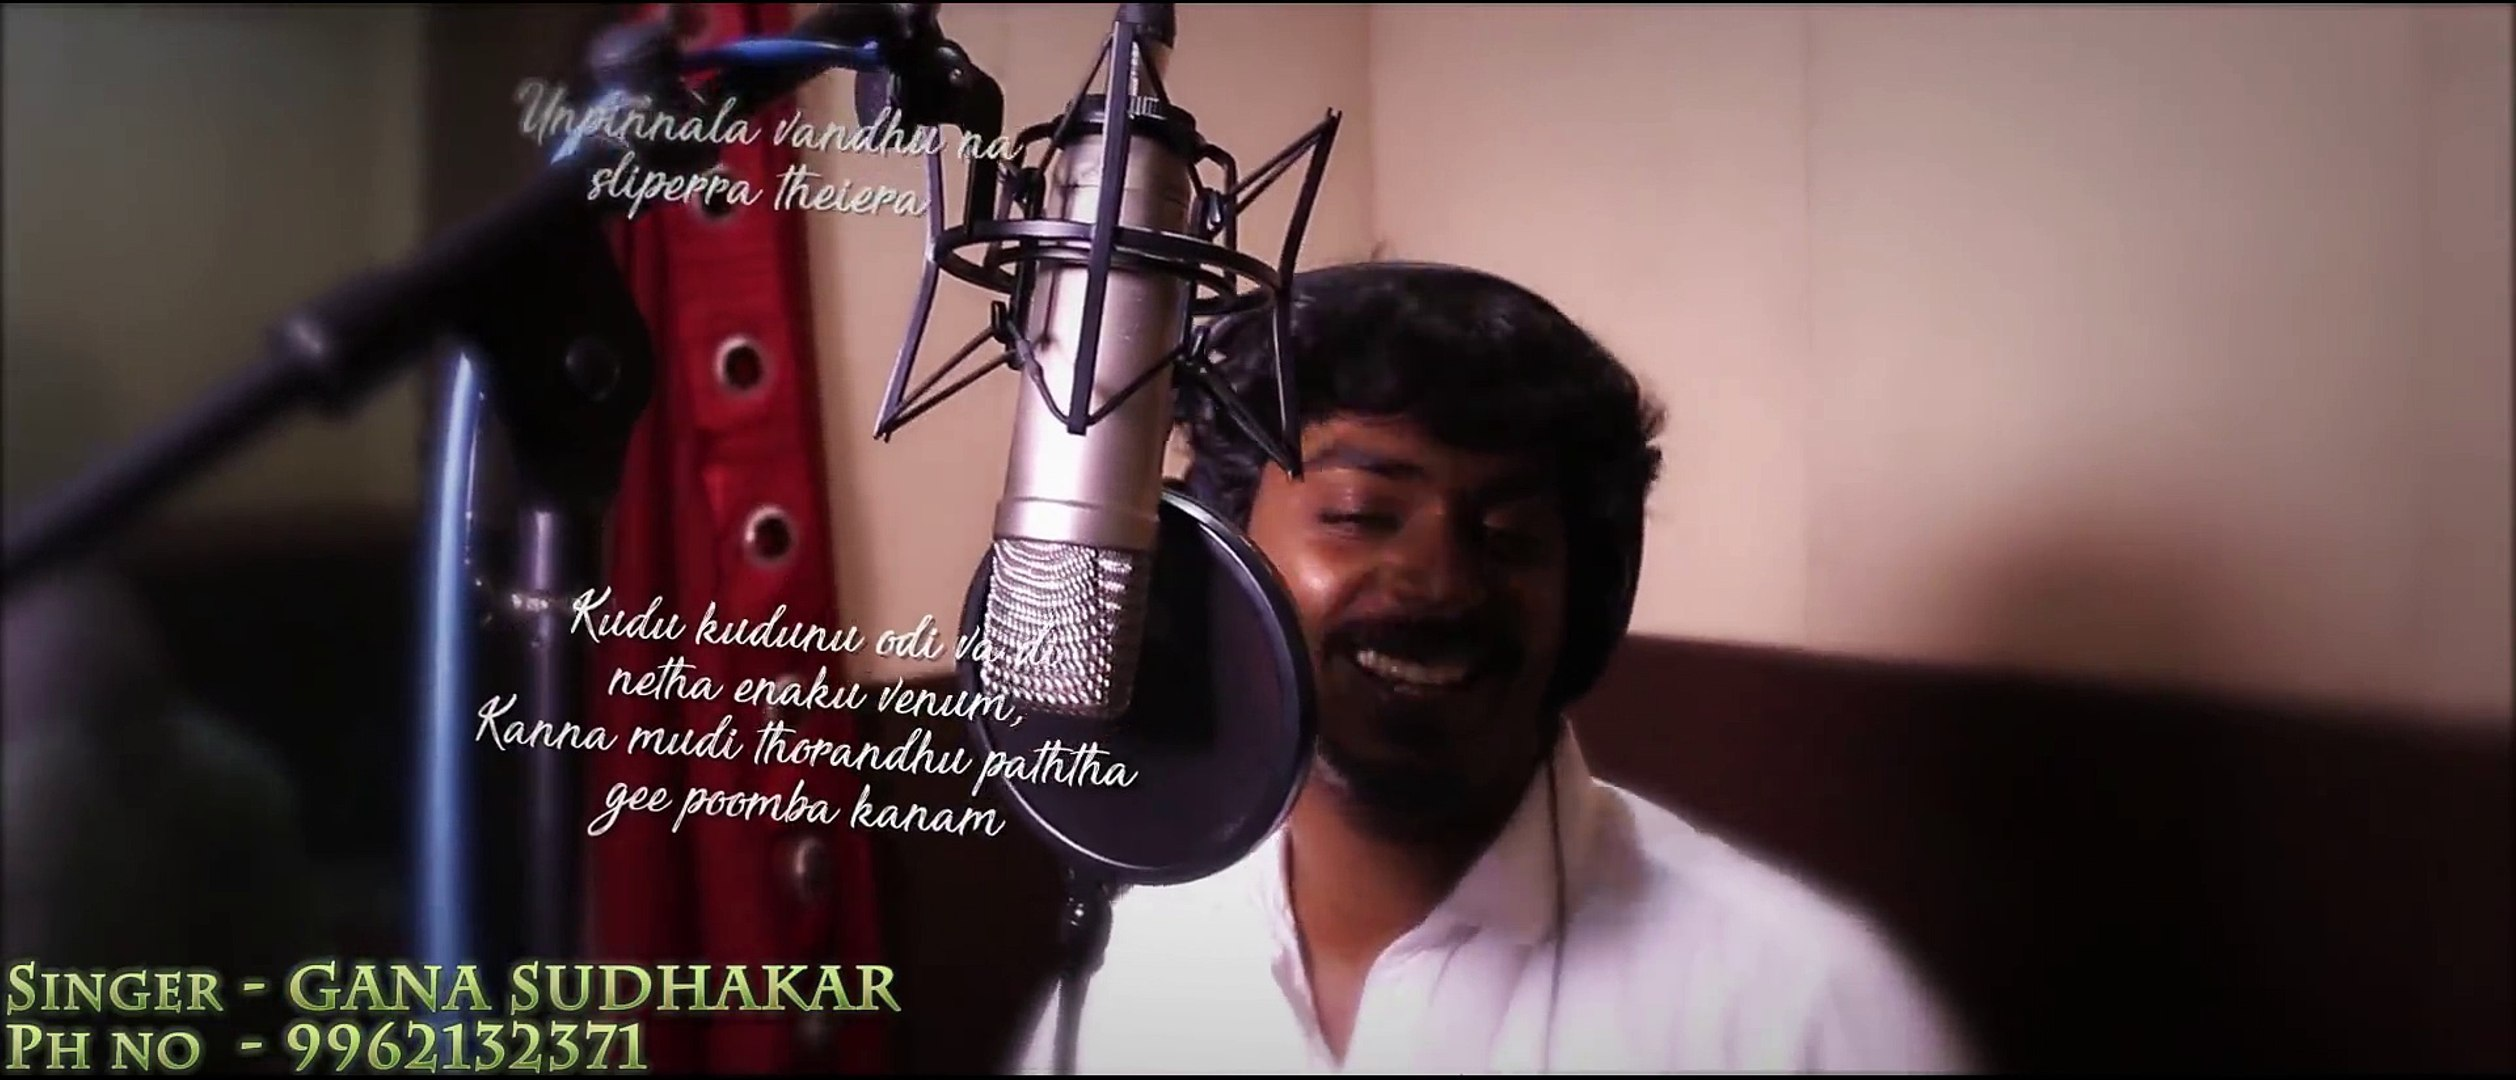 gana sudhakar audio songs download tamil mp3